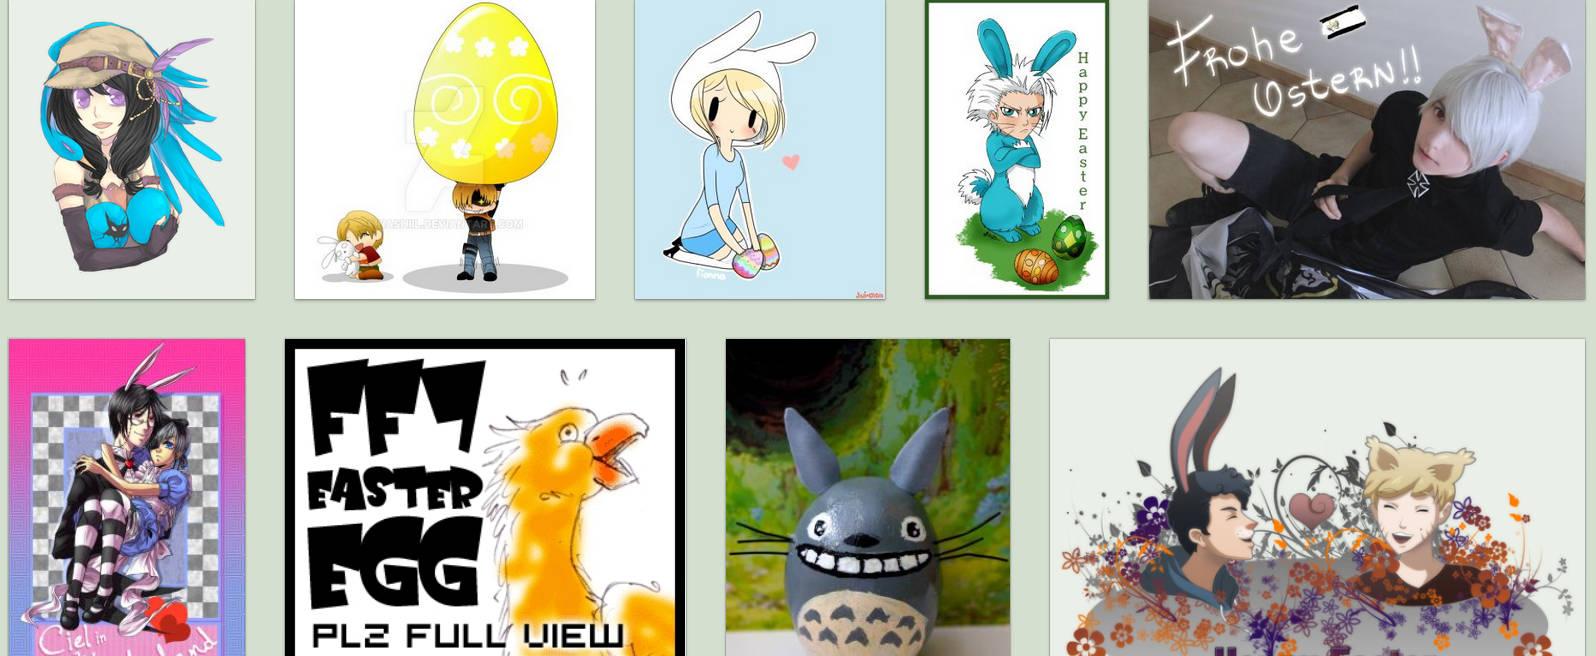 Wielkanocne rysunki z anime na DeviantArt